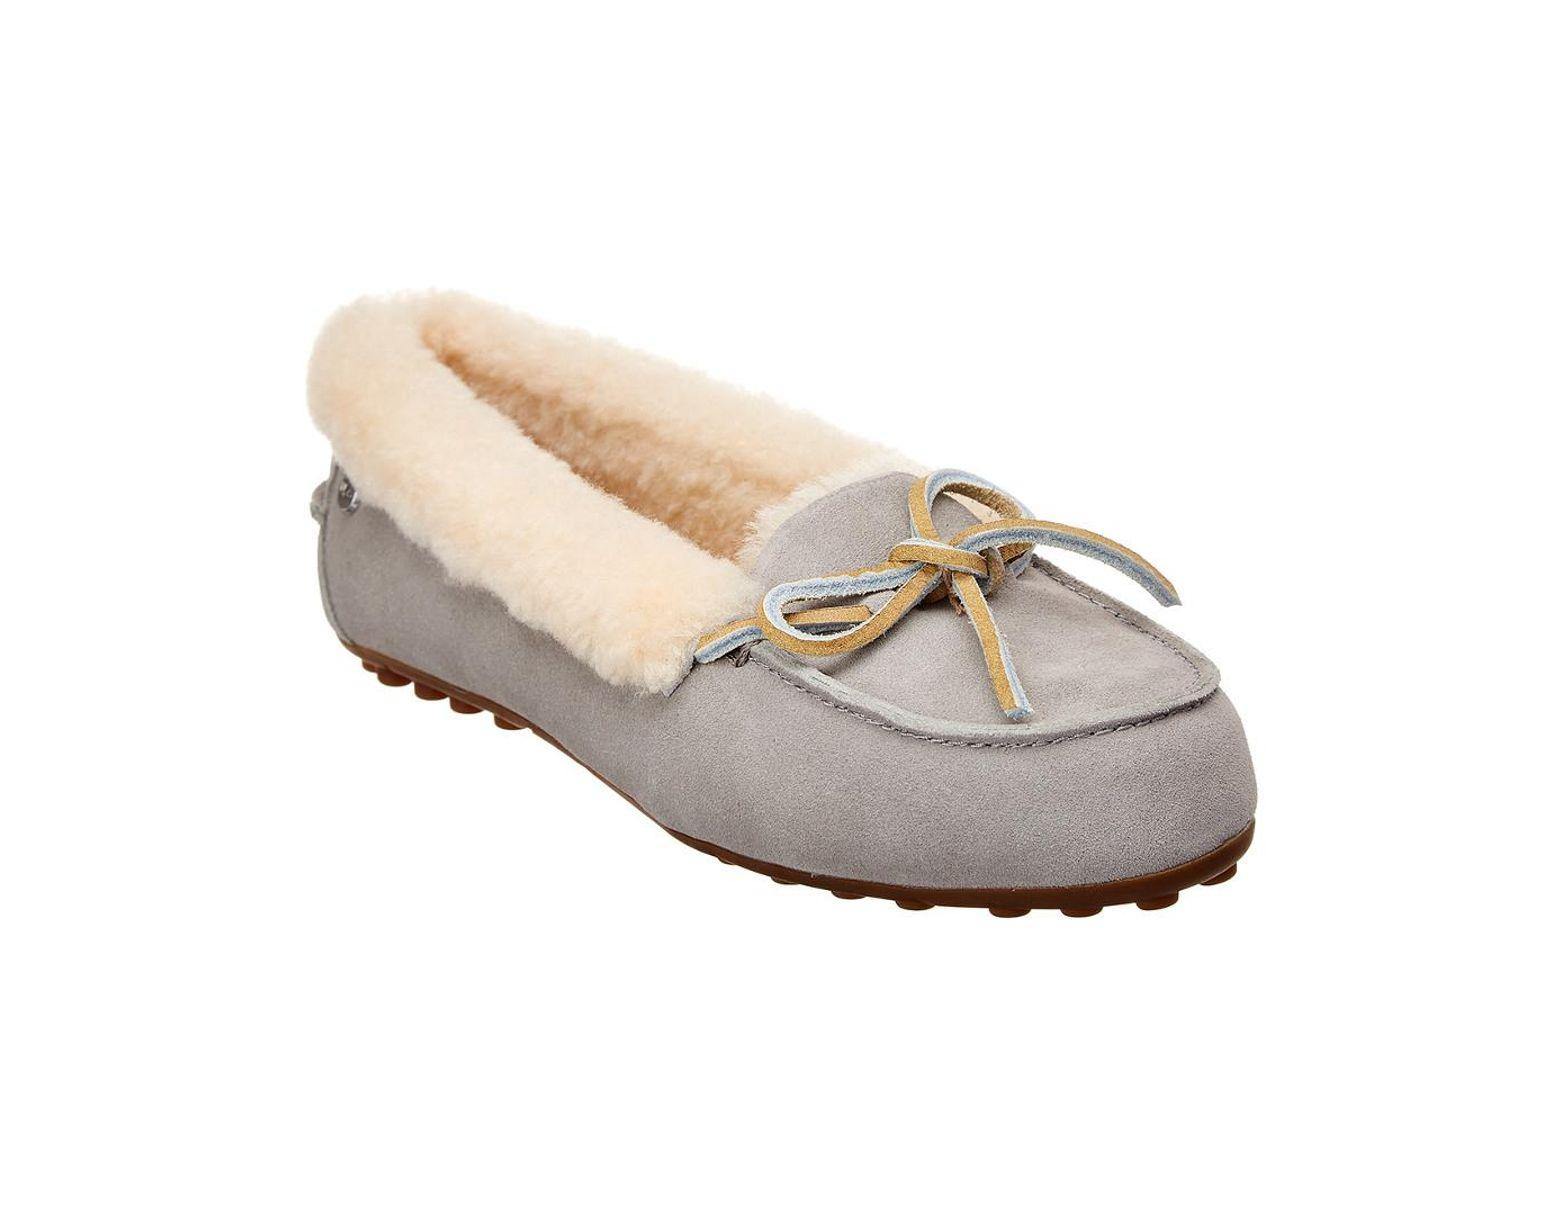 0f3989c2119 Women's Gray Solana Suede Loafer Slipper